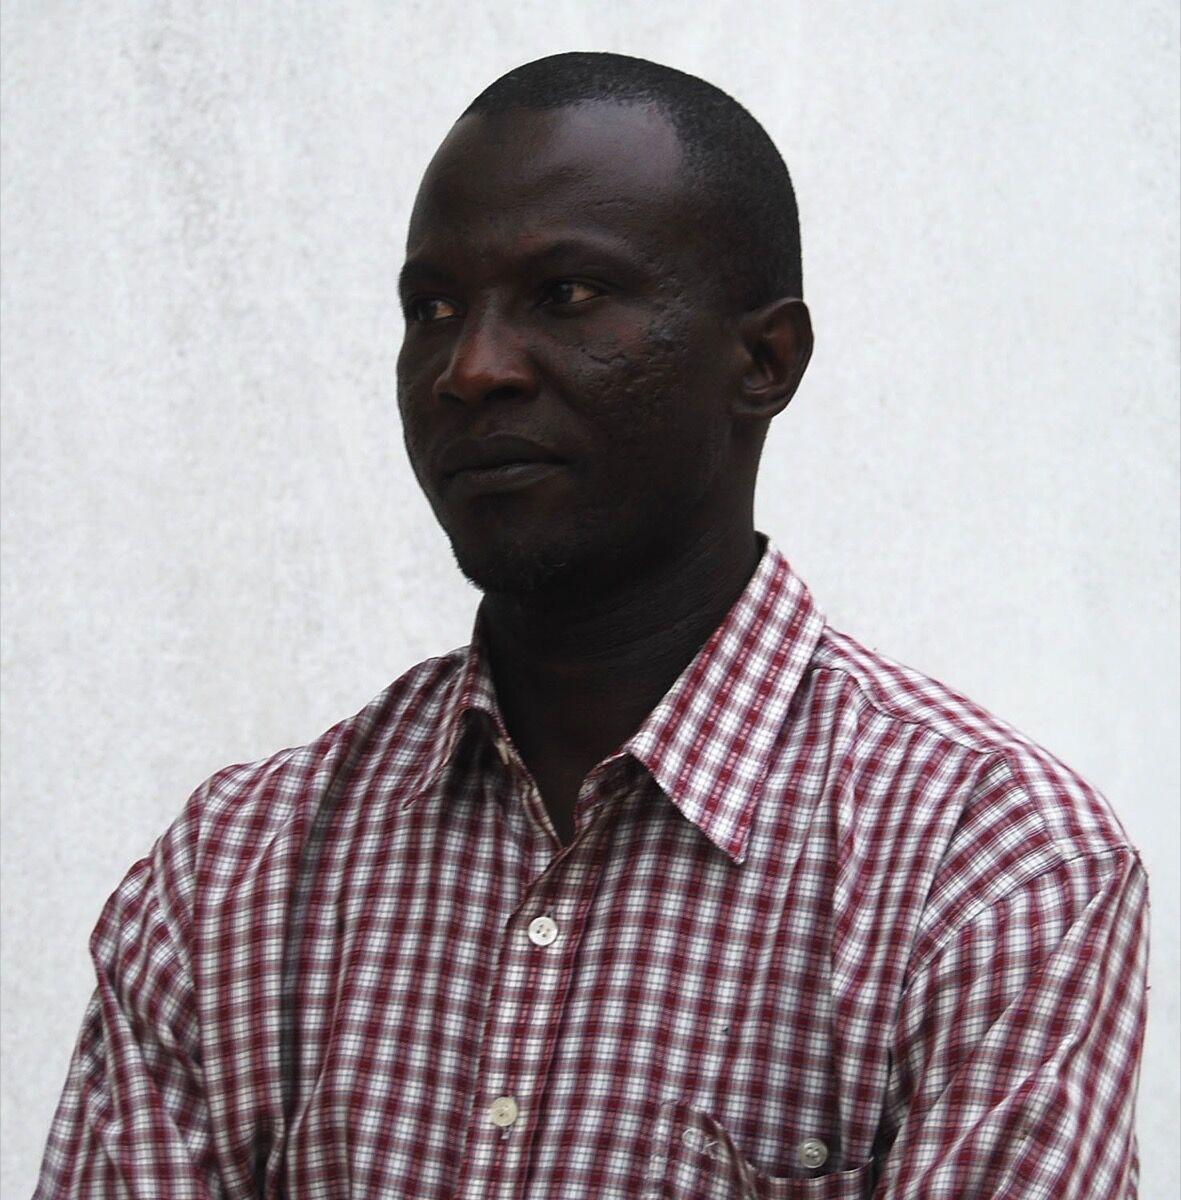 Portrait of Kassou Seydou. Courtesy of Galerie Cécile Fakhoury.